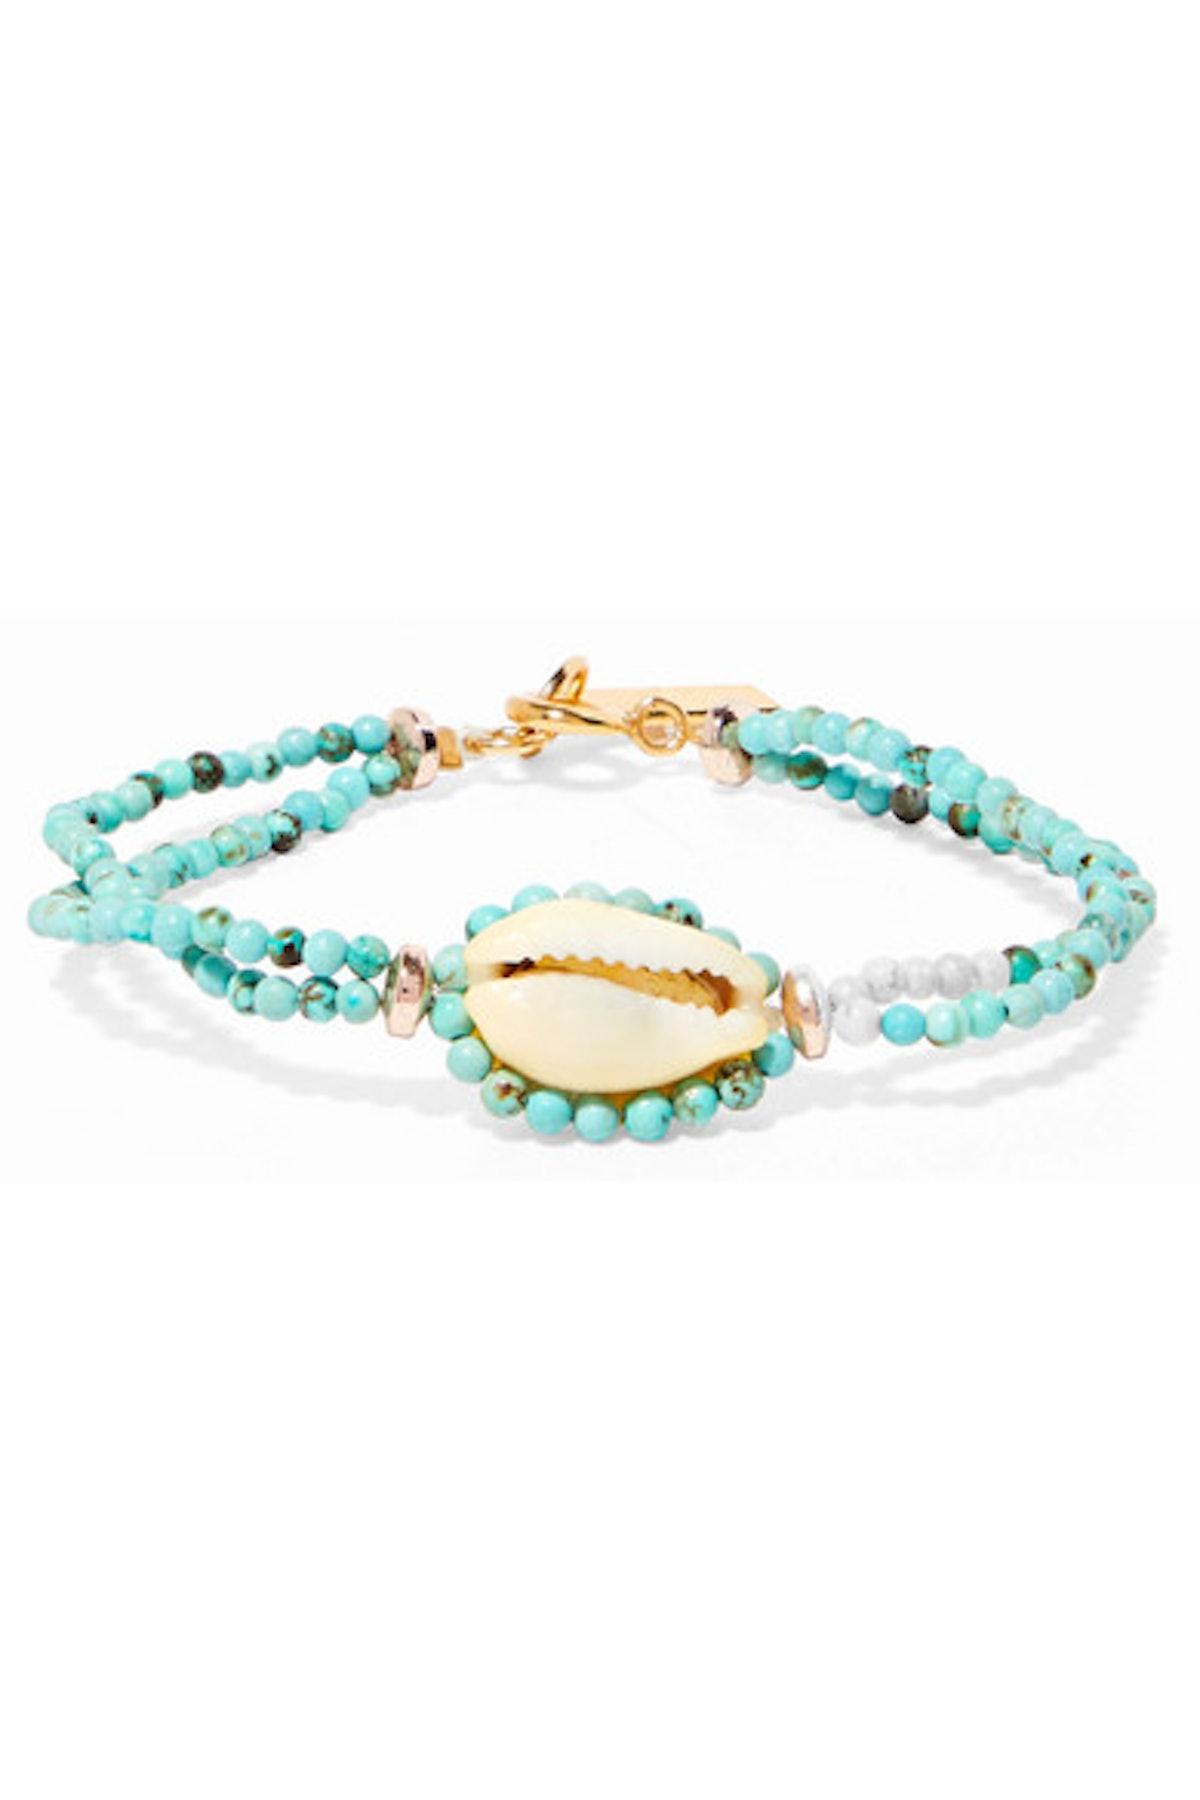 Isabel Marant Gold-tone, bead and shell bracelet